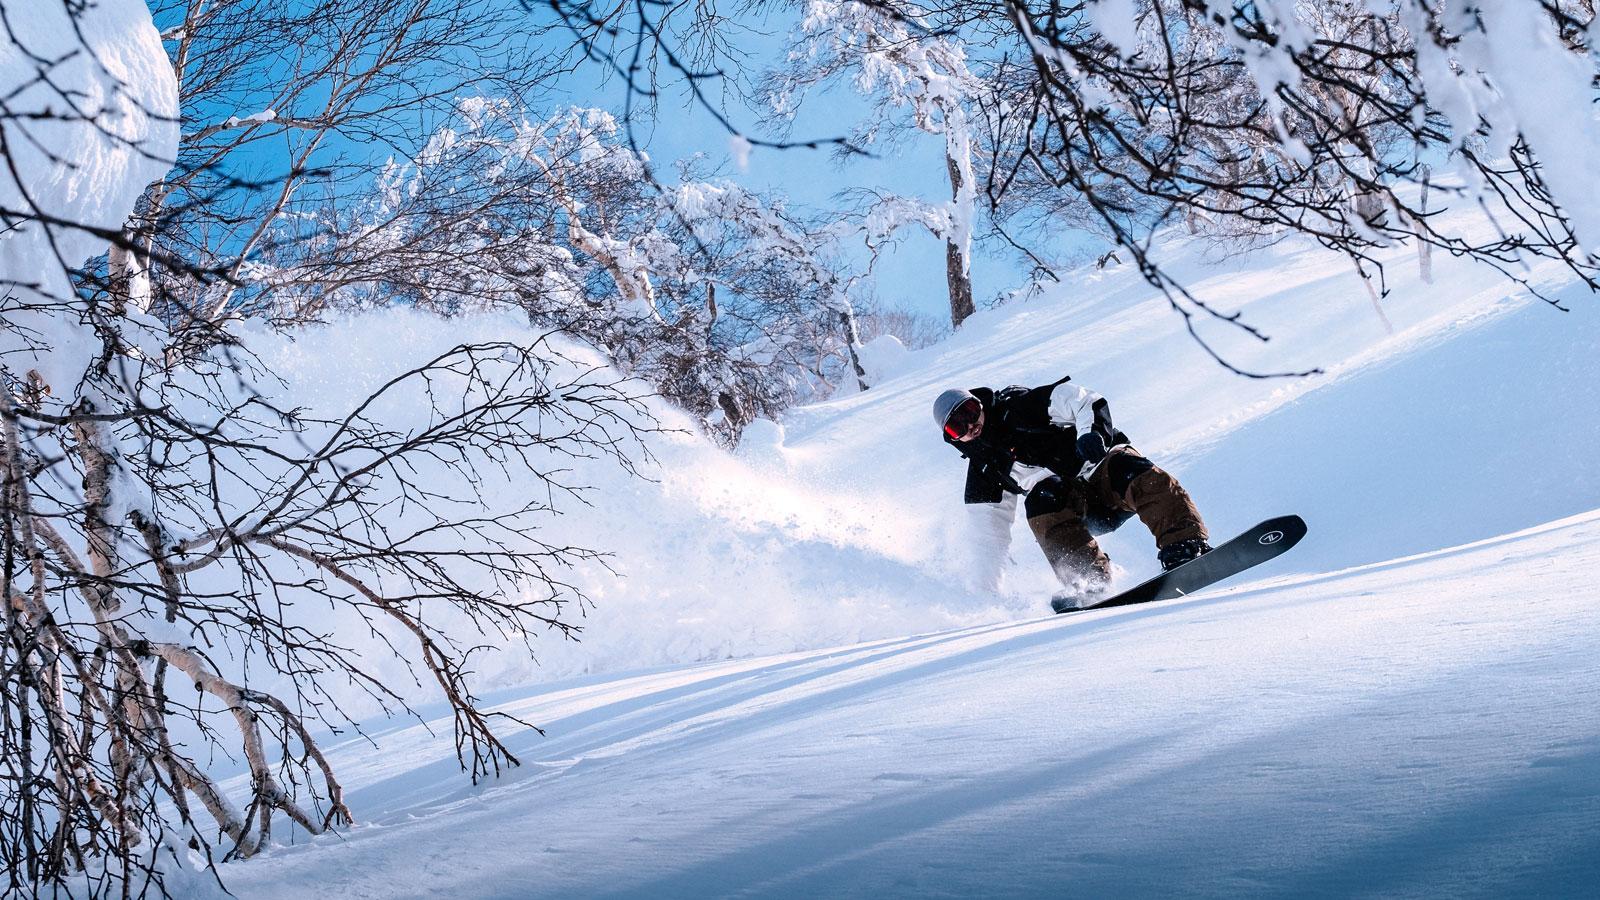 Nidecker FW20/21 Snowboard Preivew